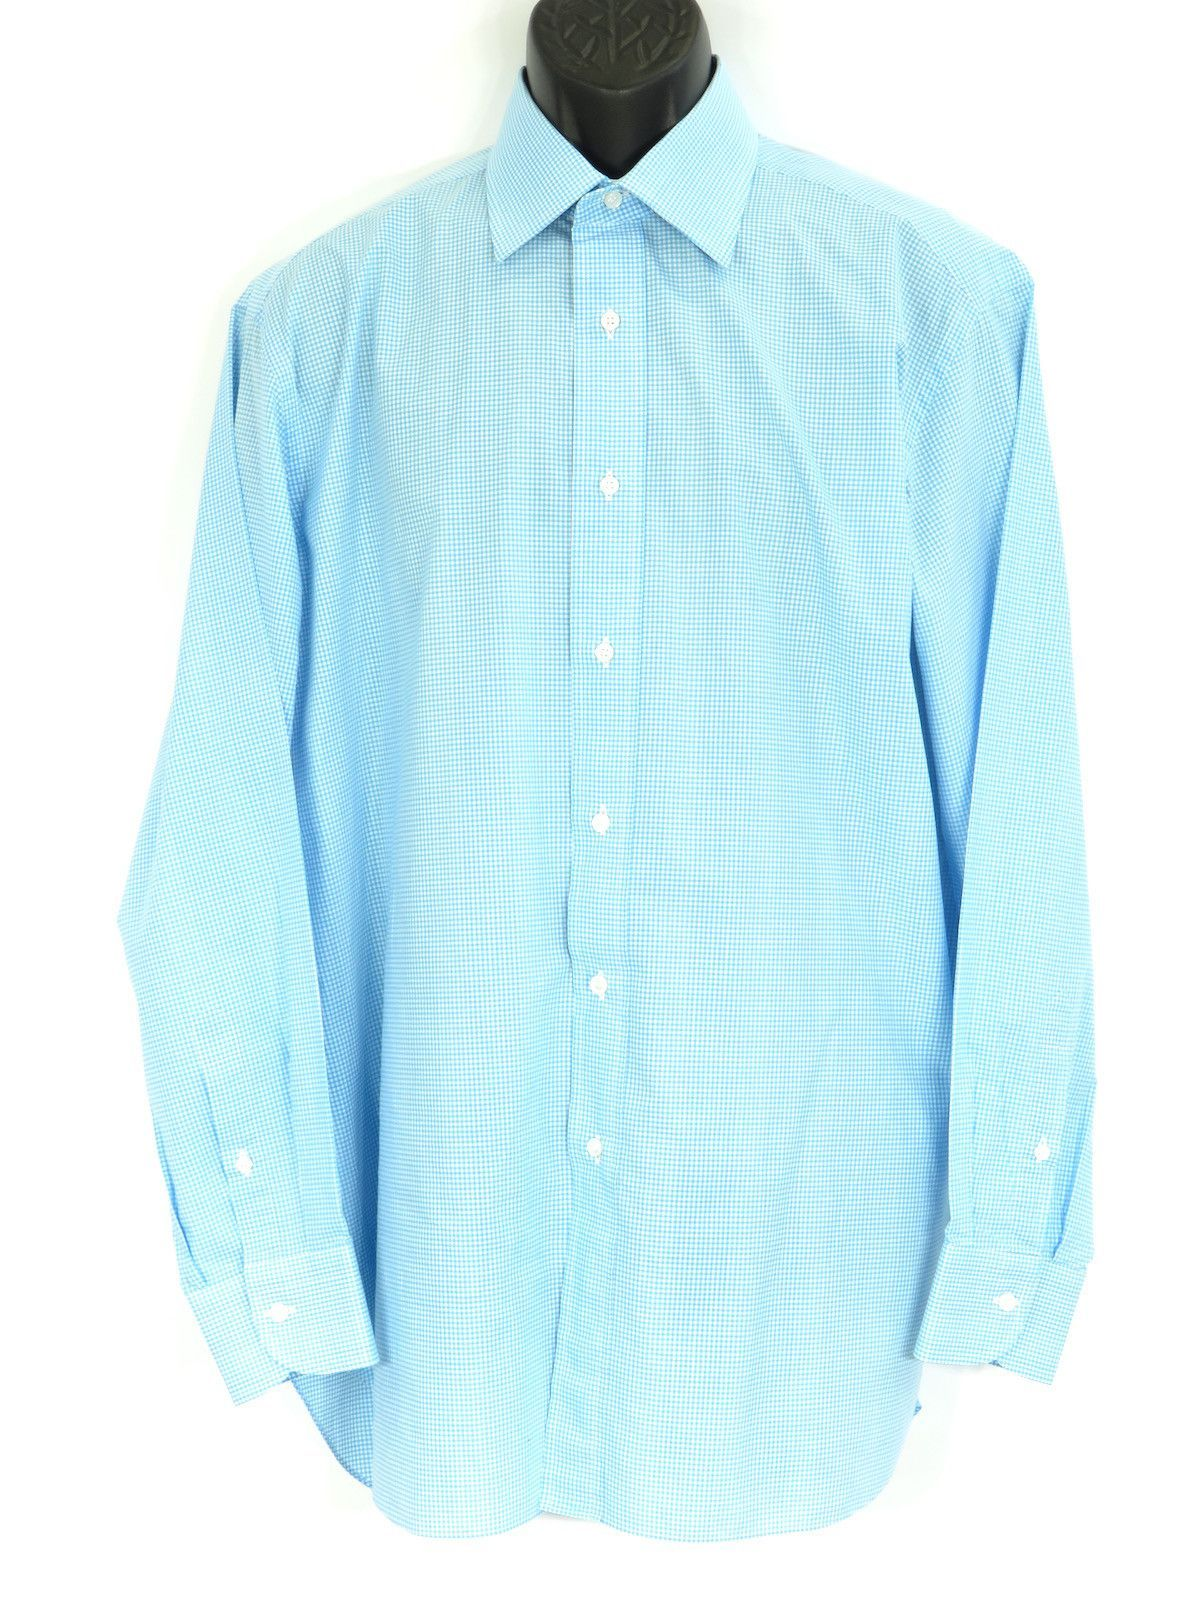 Green checkered dress shirt  BRIONI Men Blue White Checkered Pattern Long Sleeve Button Down